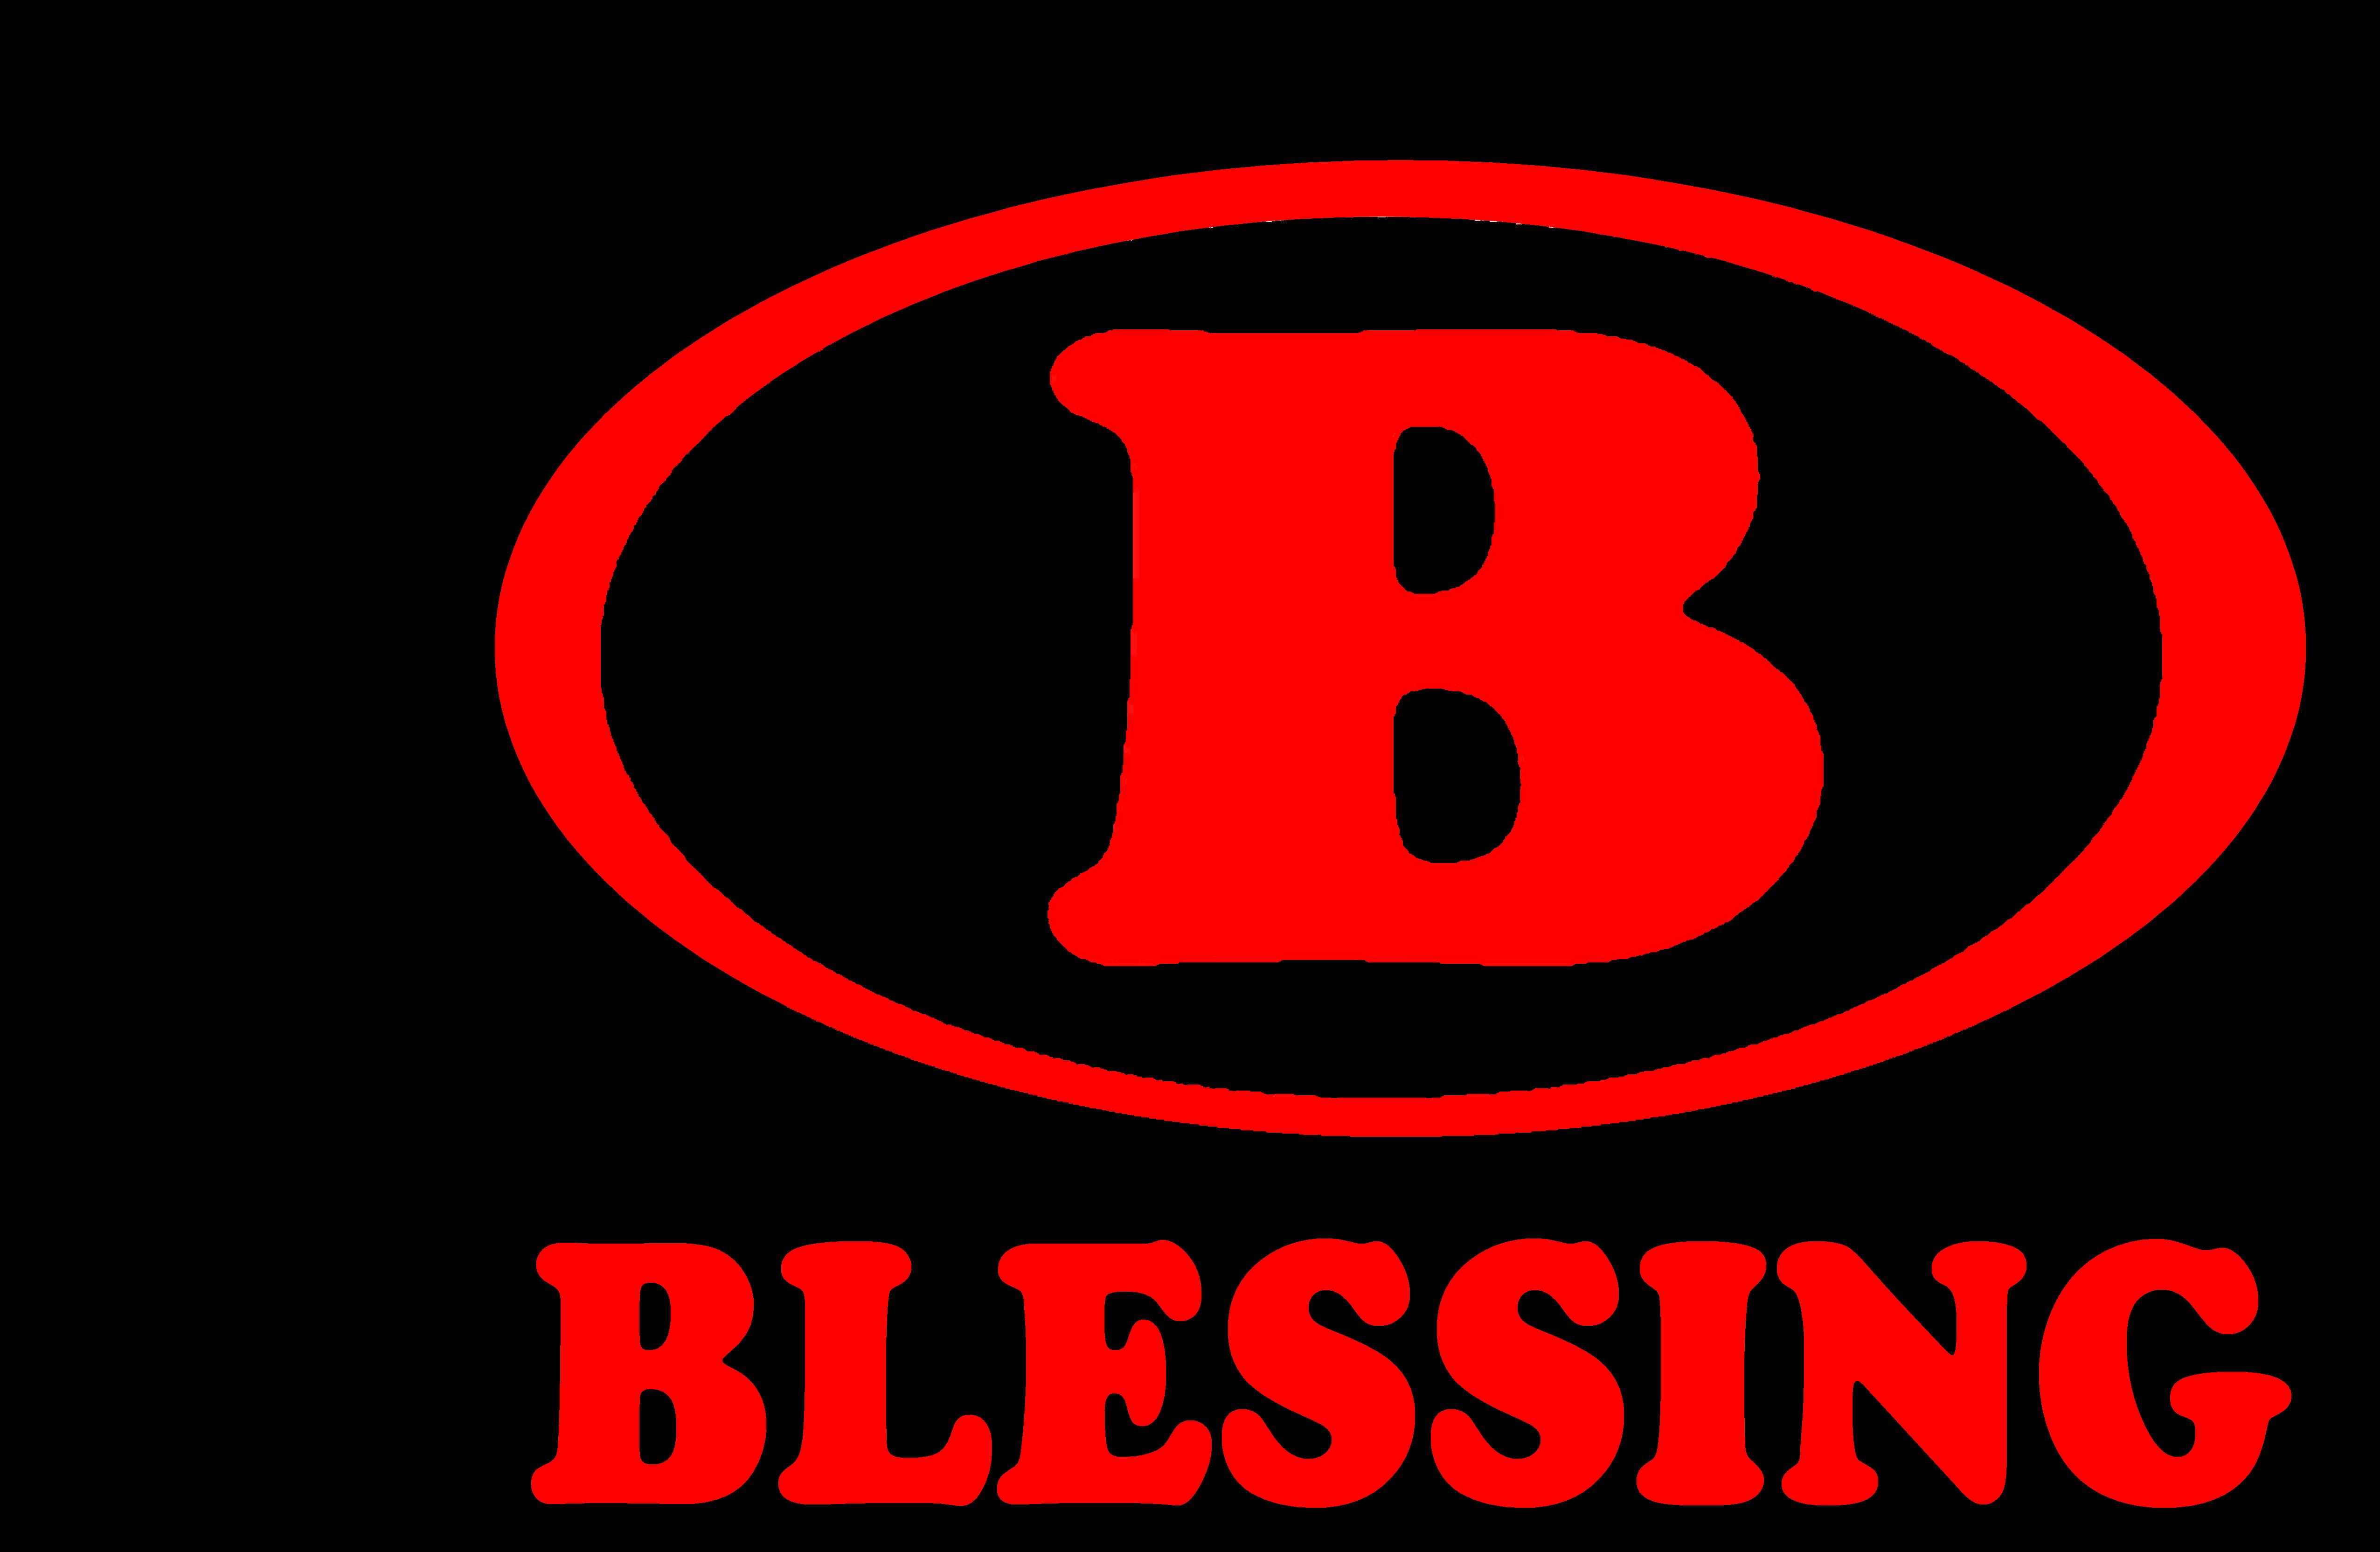 File:Blessing Logo.png.